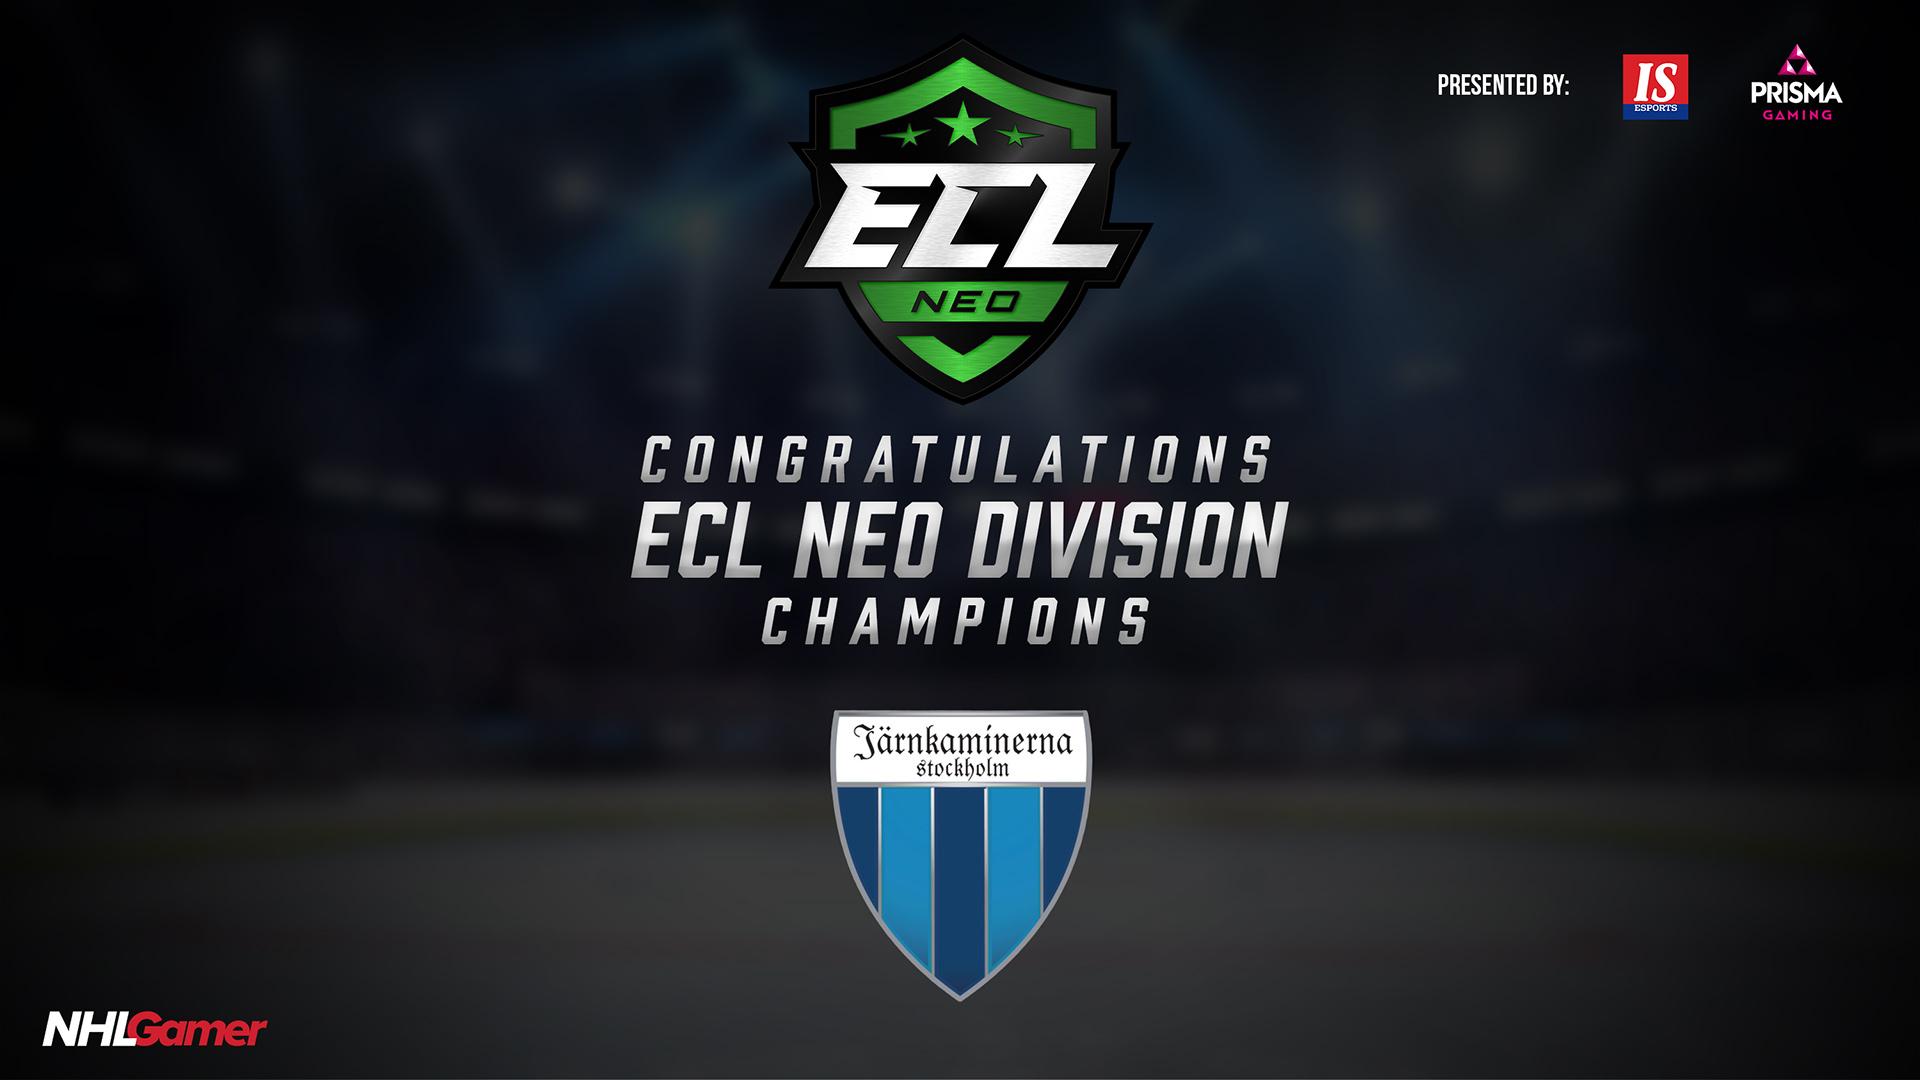 ECL_Neo_Champions.jpg